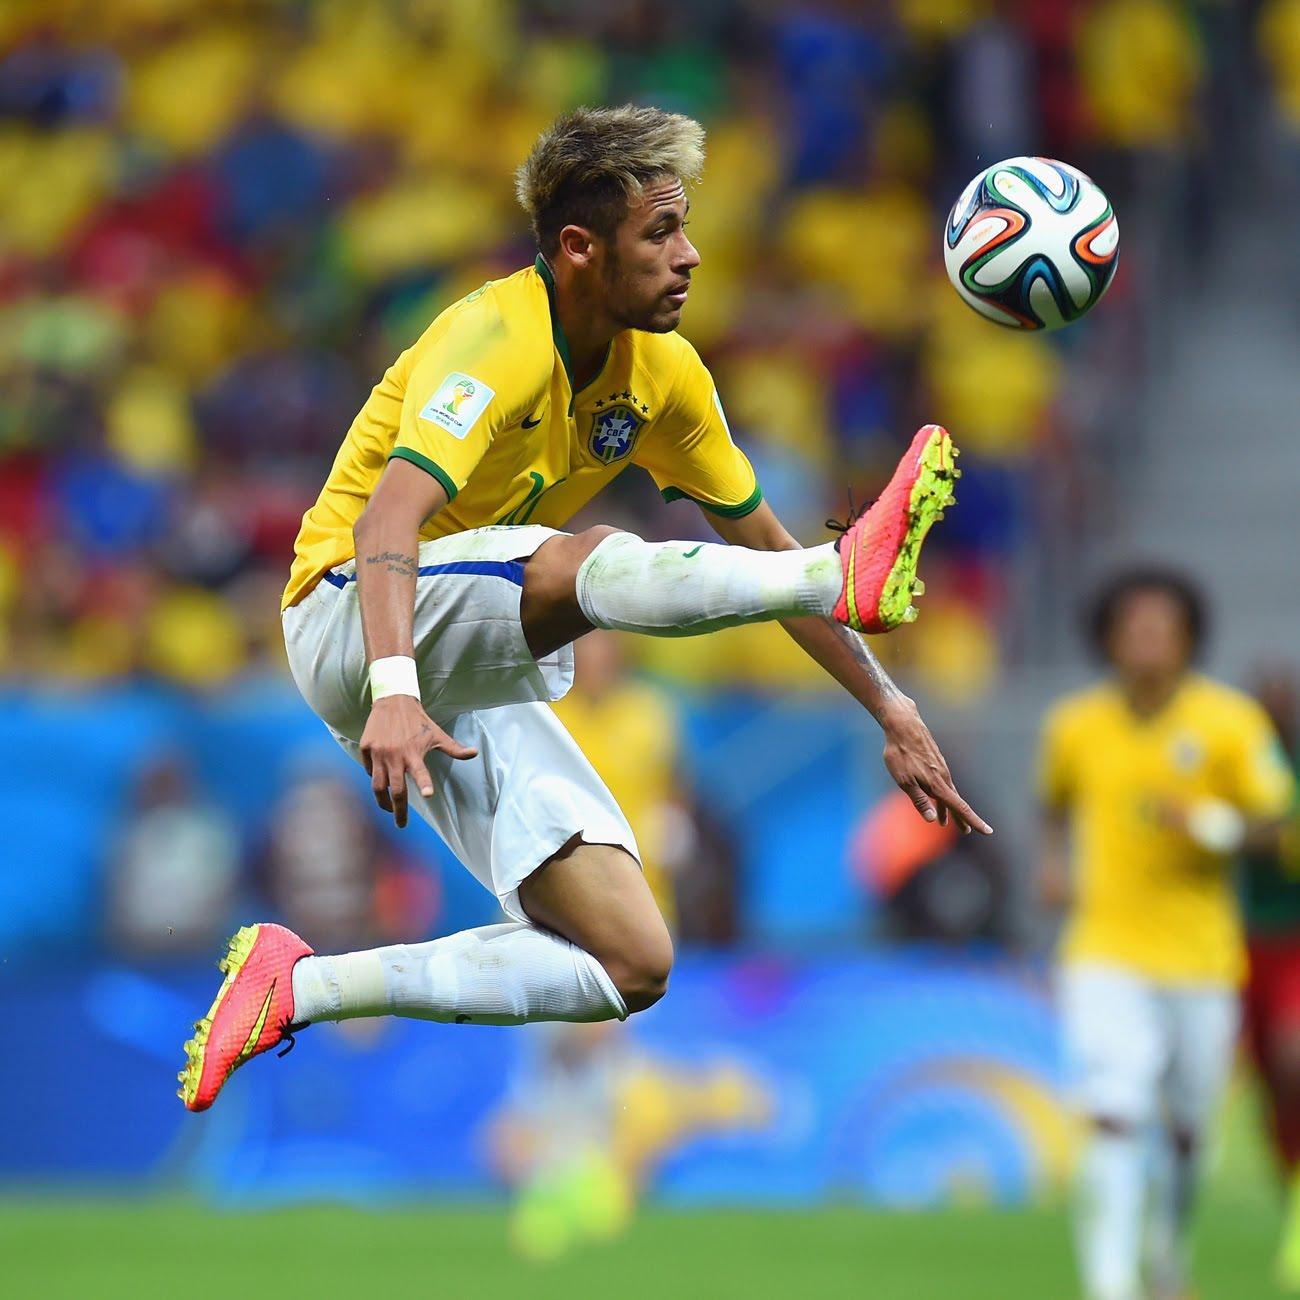 Craziest Football Skills Mix Neymar Messi Ronaldo Hazard